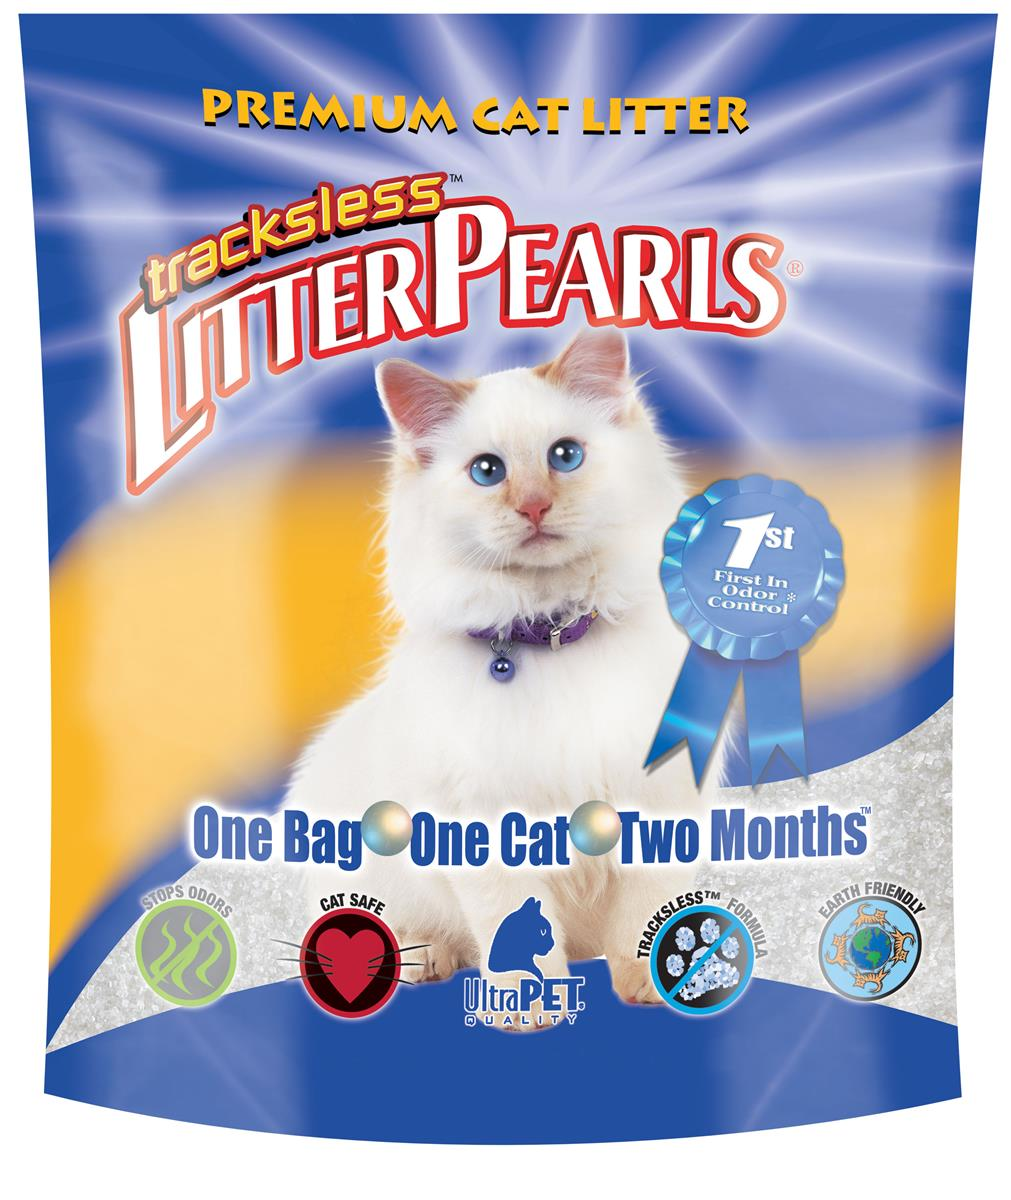 Tracksless Litter Pearls Katteperler 7,6L 8lbs